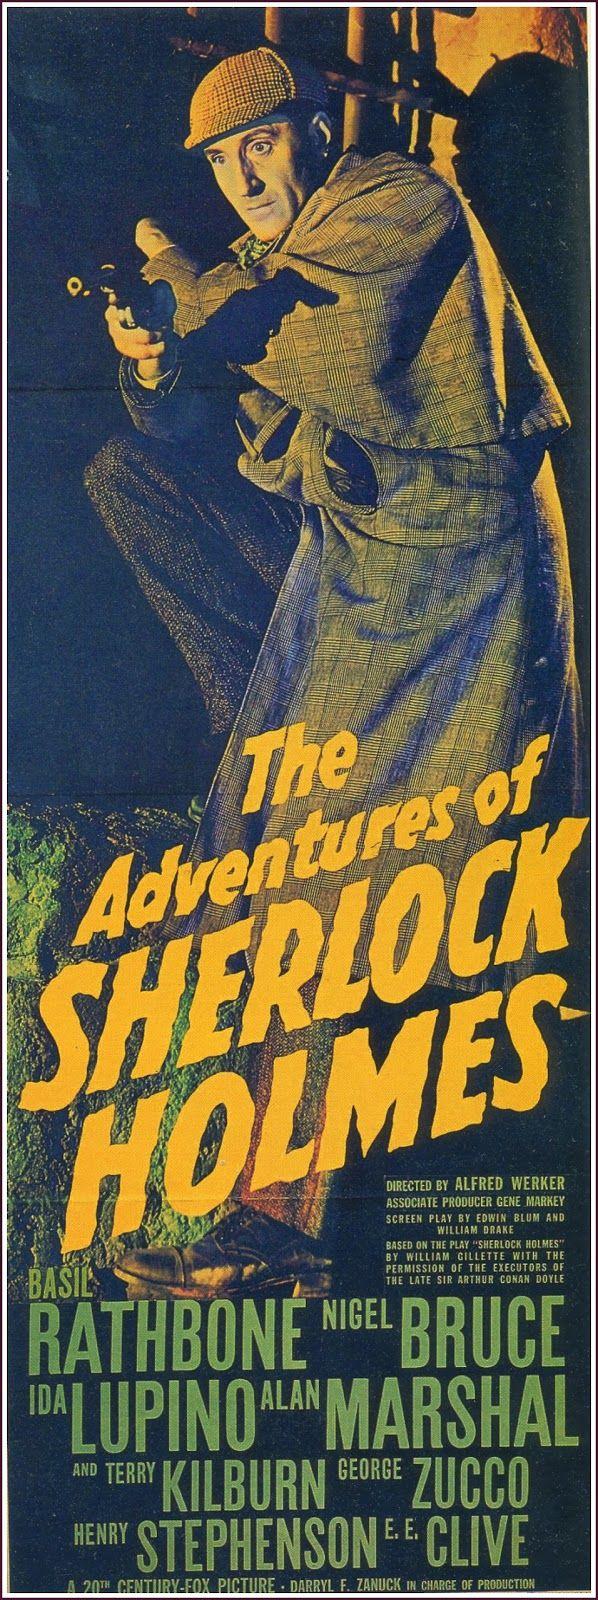 THE ADVENTURES OF SHERLOCK HOLMES (1939) - Basil Rathbone - Nigel Bruce - Ida Lupino - 20th Century-Fox - Insert Movie Poster.